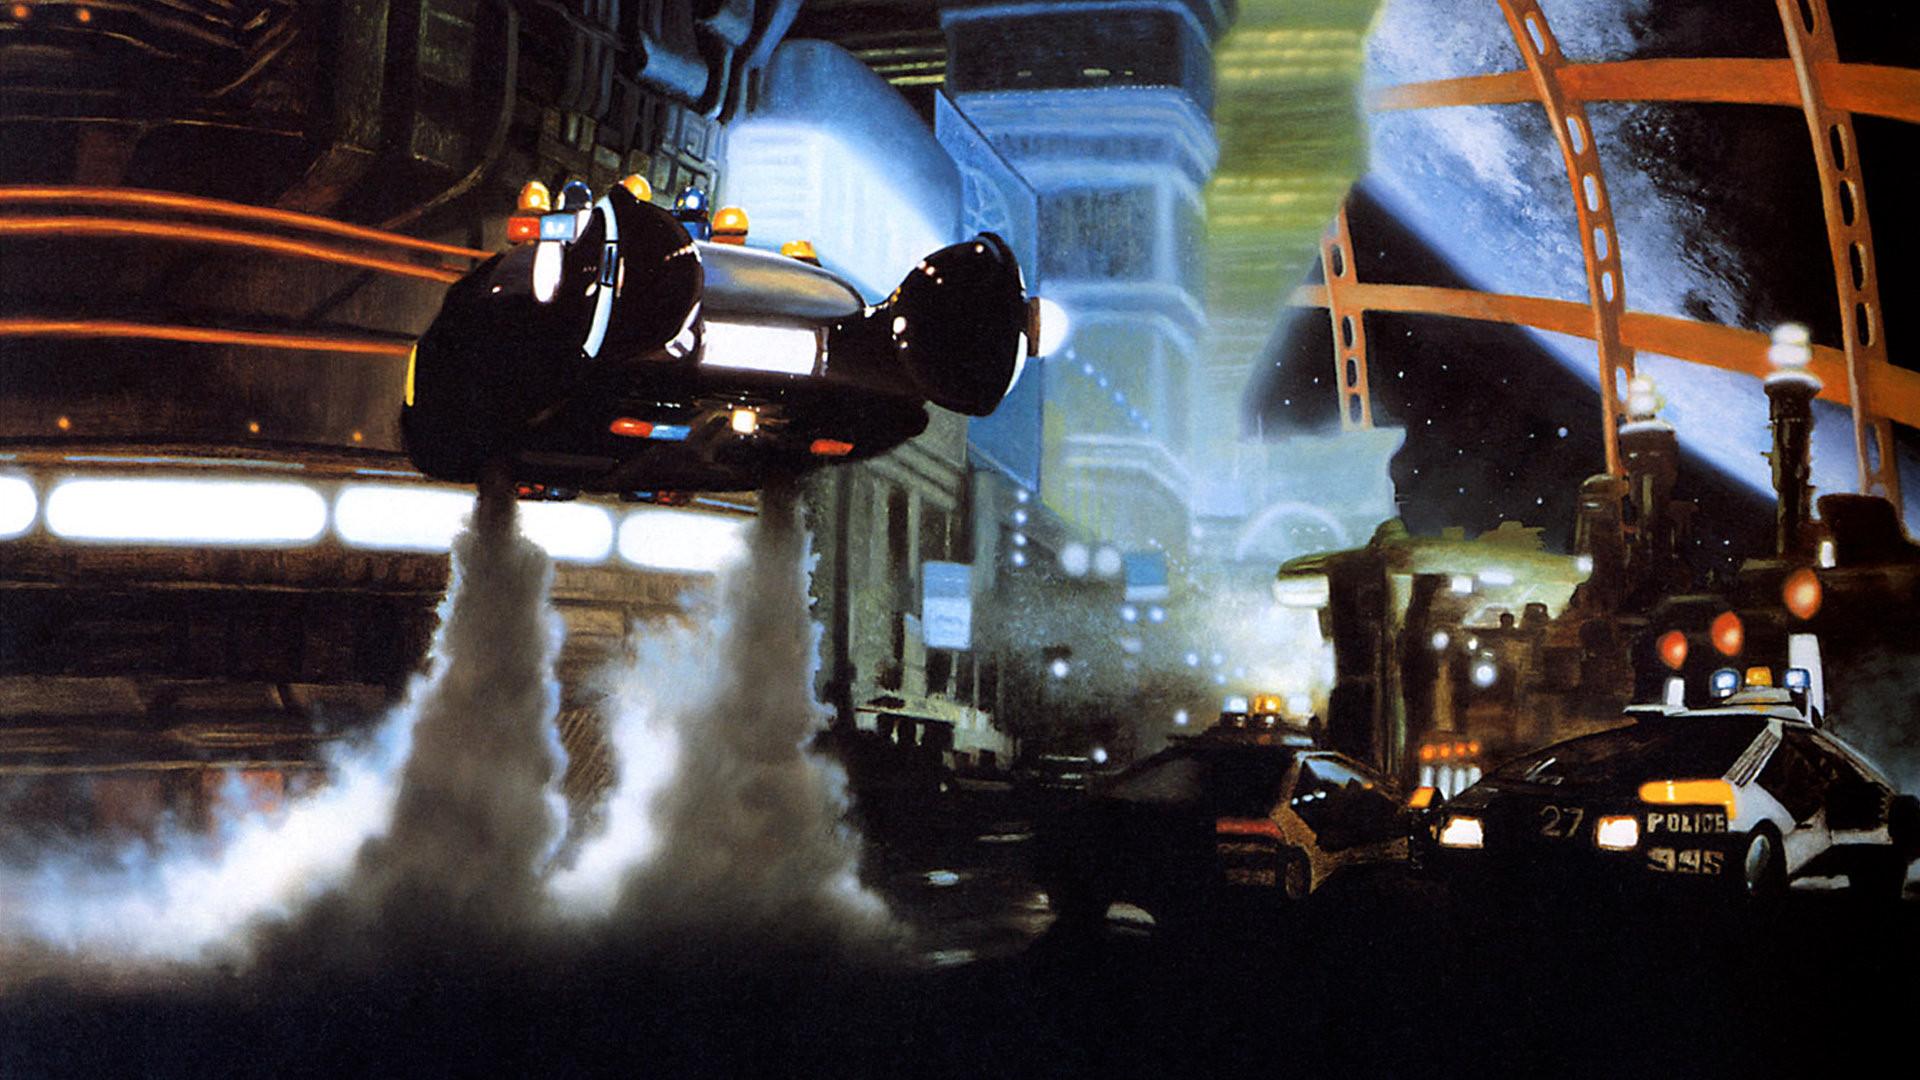 Blade Runner Wallpapers HD 5 Wallpapers Photo 1920x1080